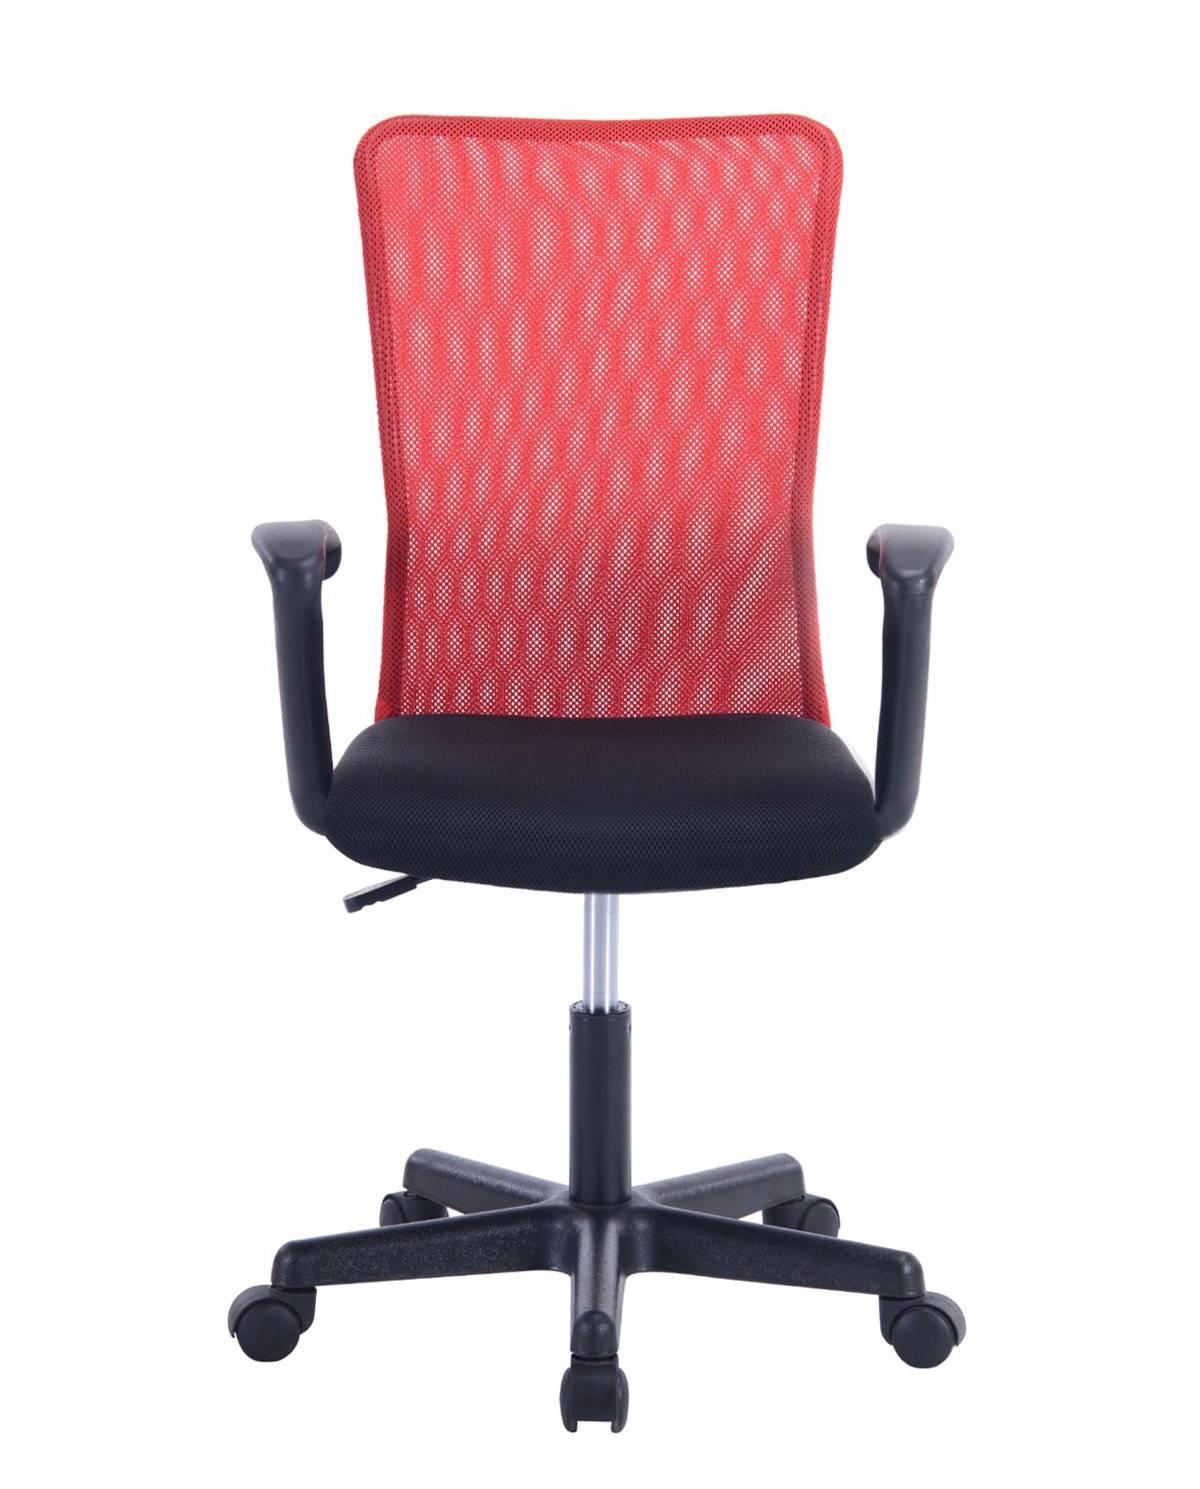 Chaise de bureau junior best chaise de bureau alinea - Carrefour chaise de bureau ...